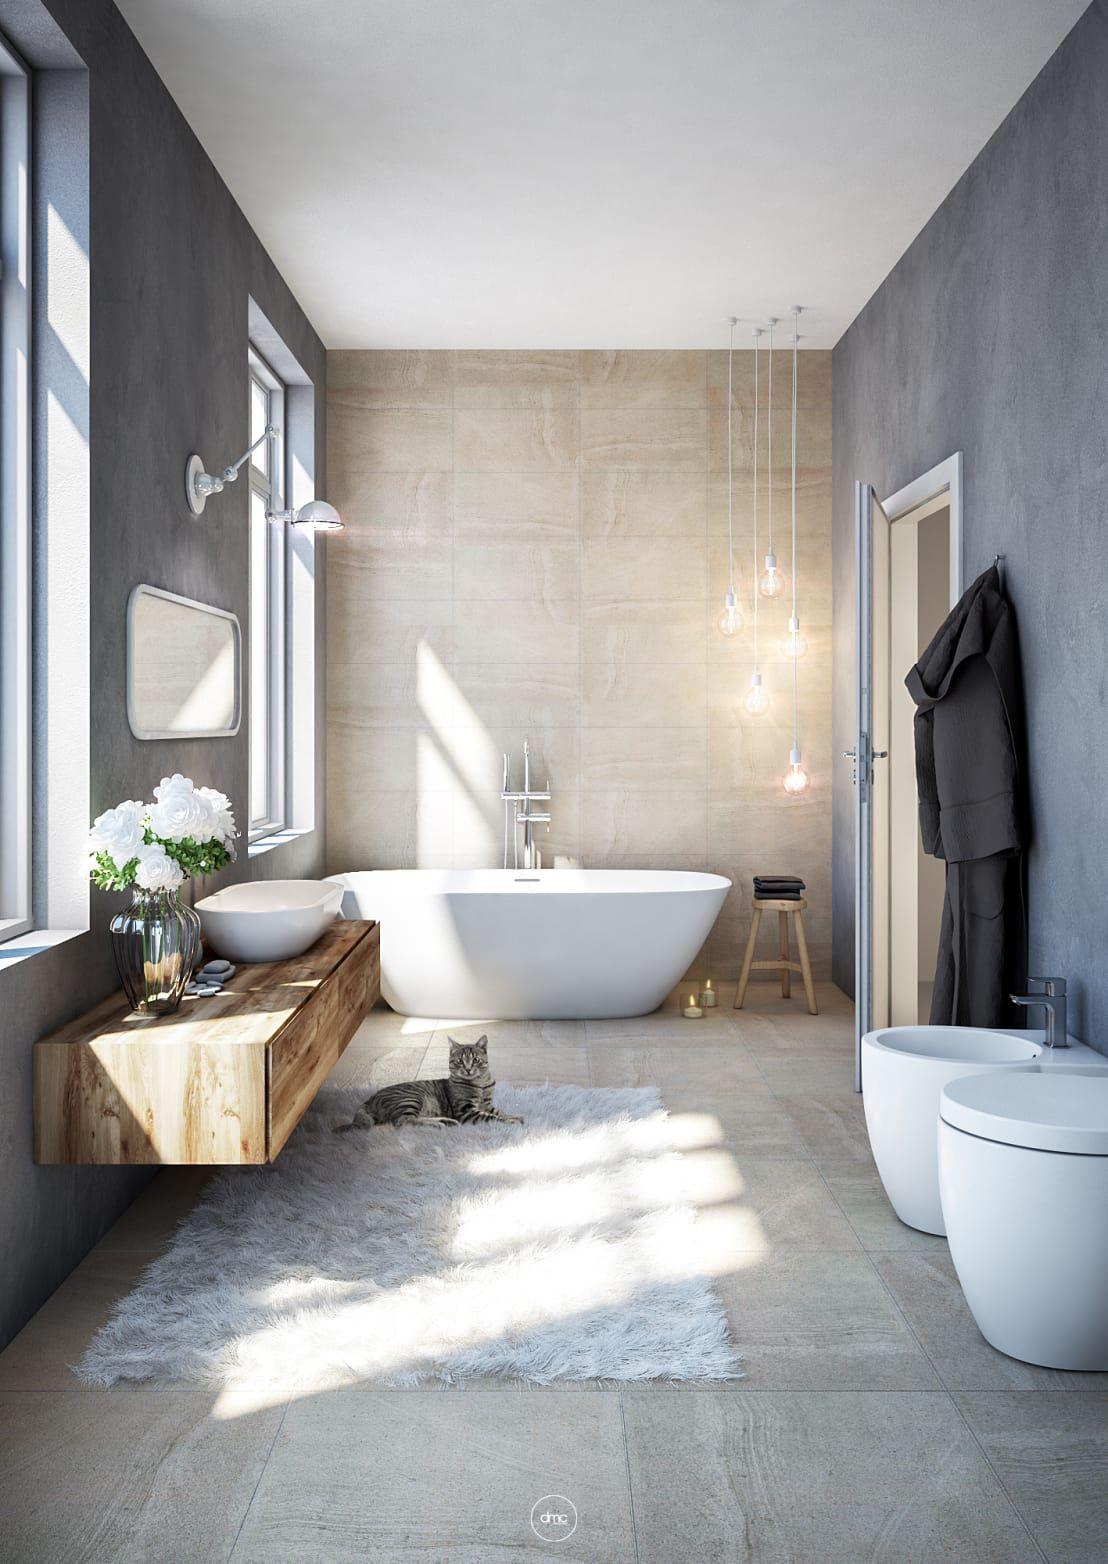 Bathroom In Sardinia Von Dmc Real Render Badezimmer Einrichtung Badezimmer Wohnung Badezimmer